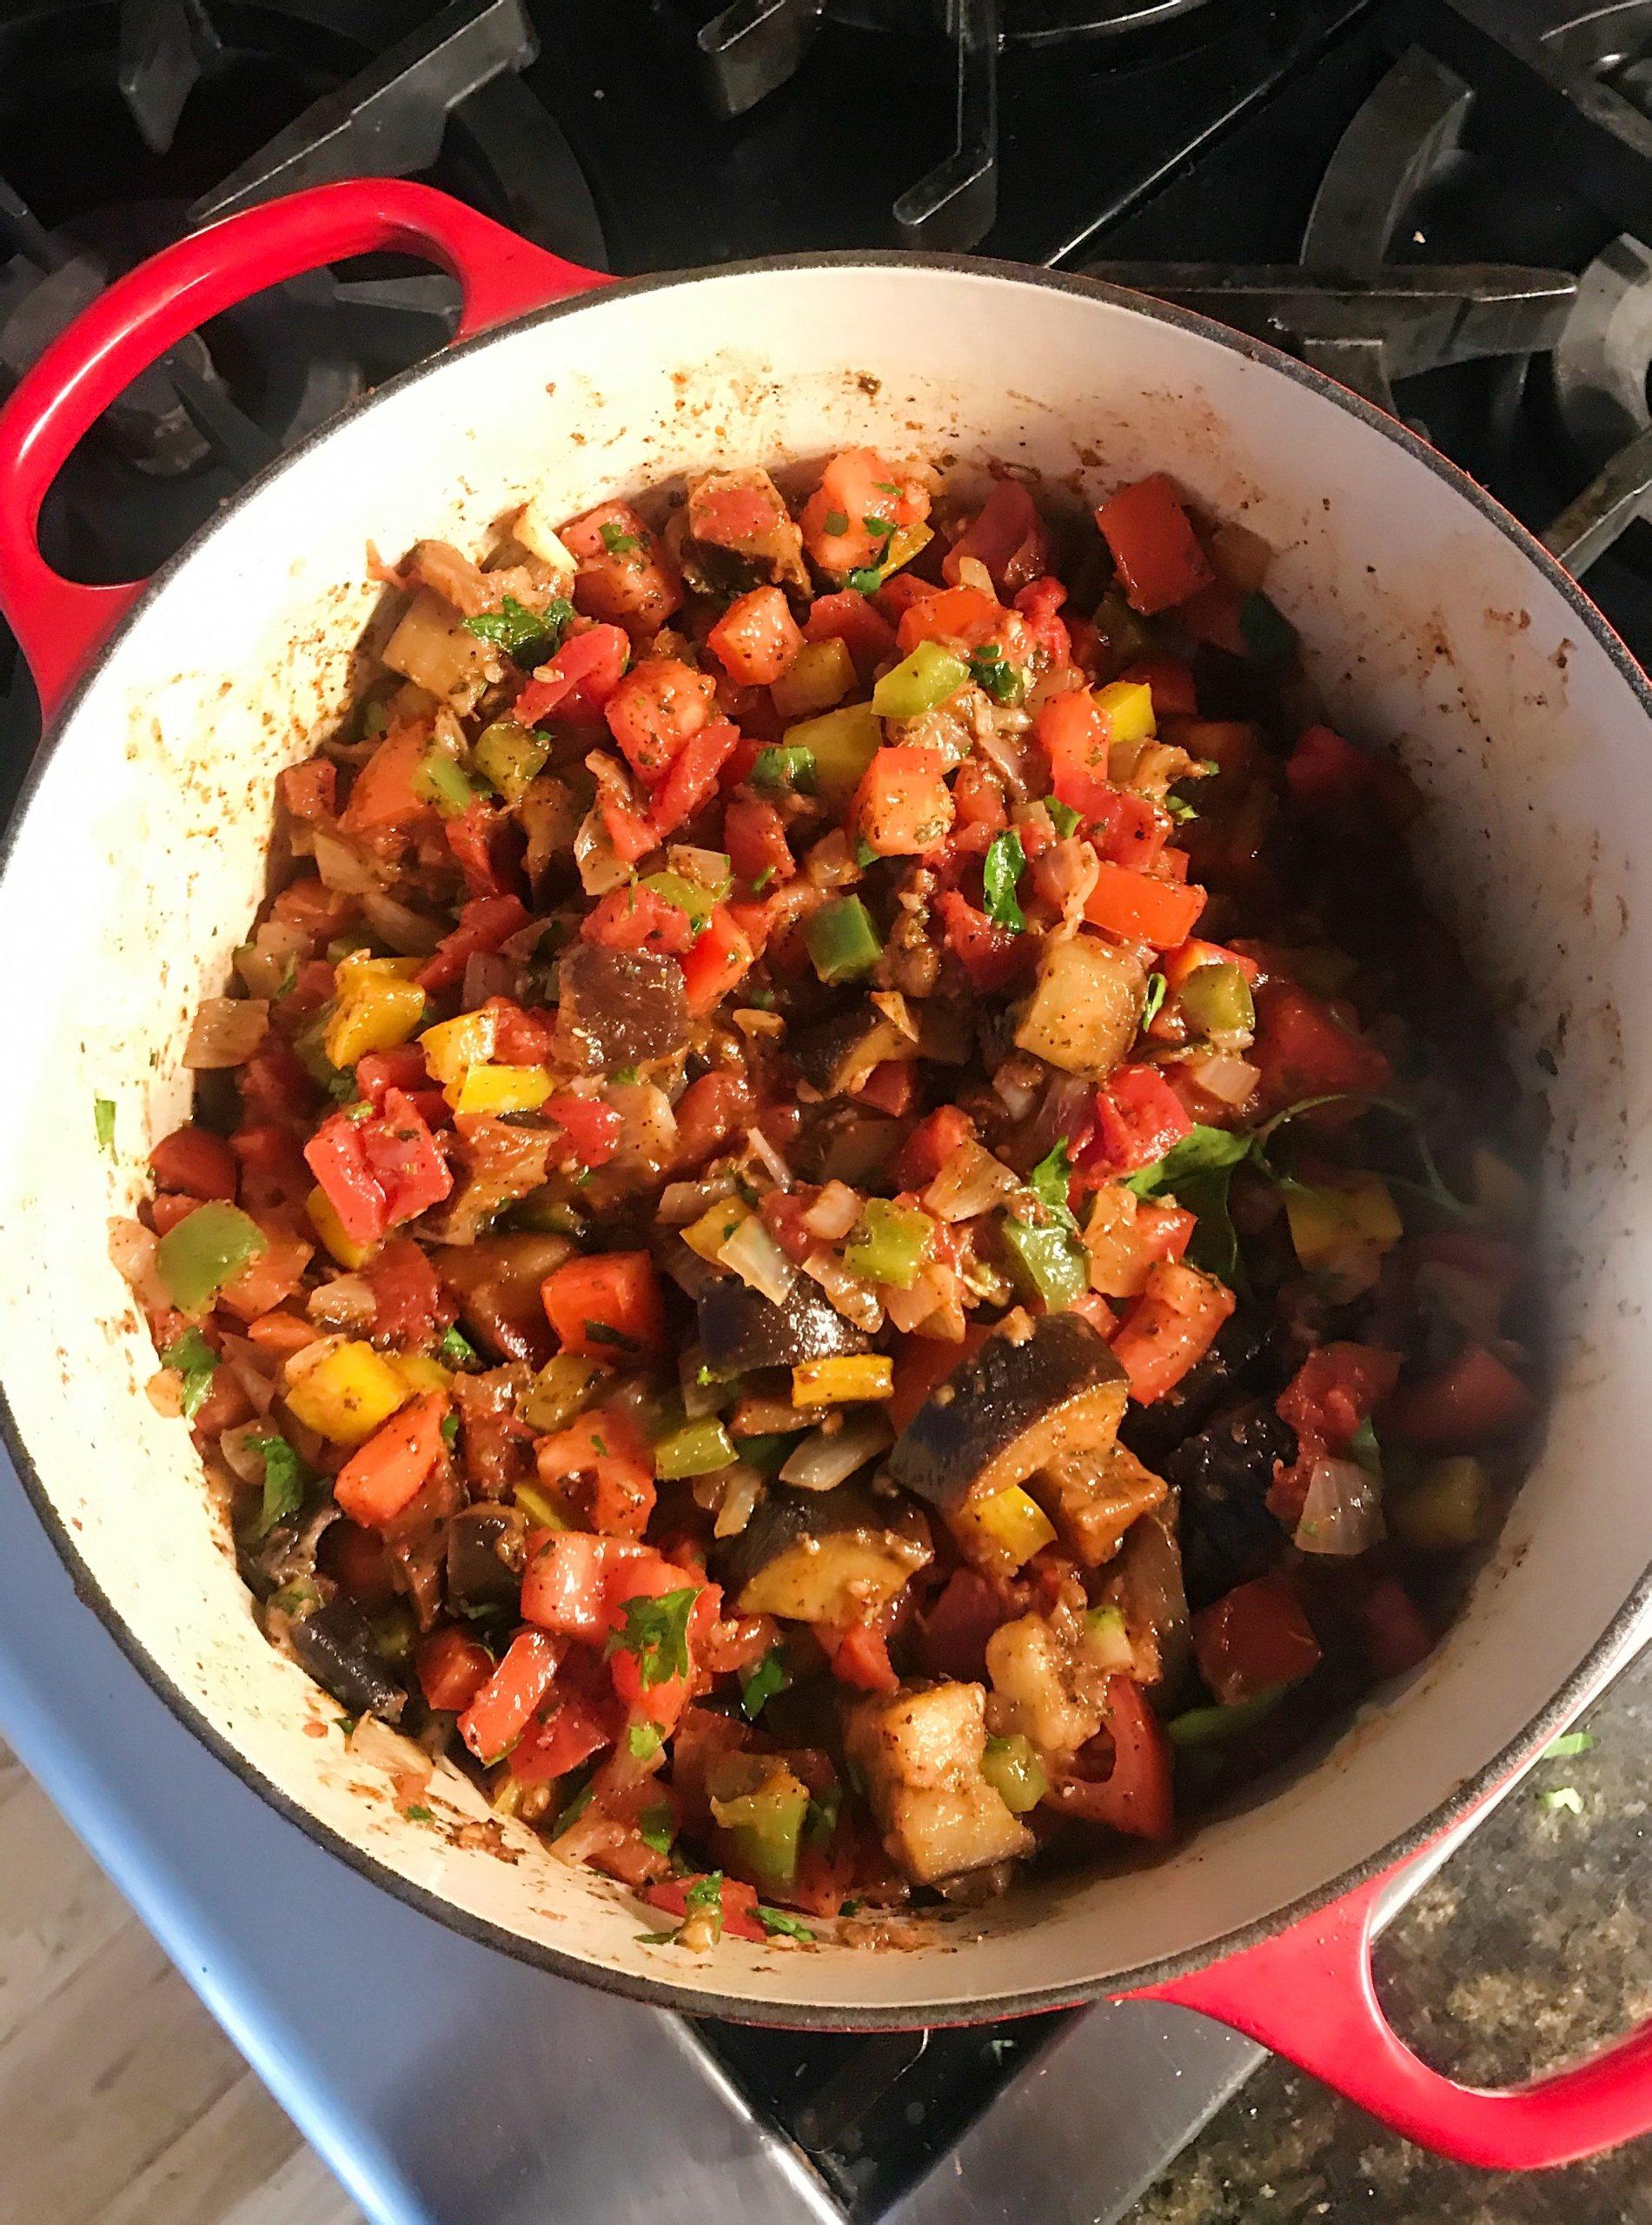 vegetarian chili gluten free #glutenfreerecipes www.healthygffamily.com